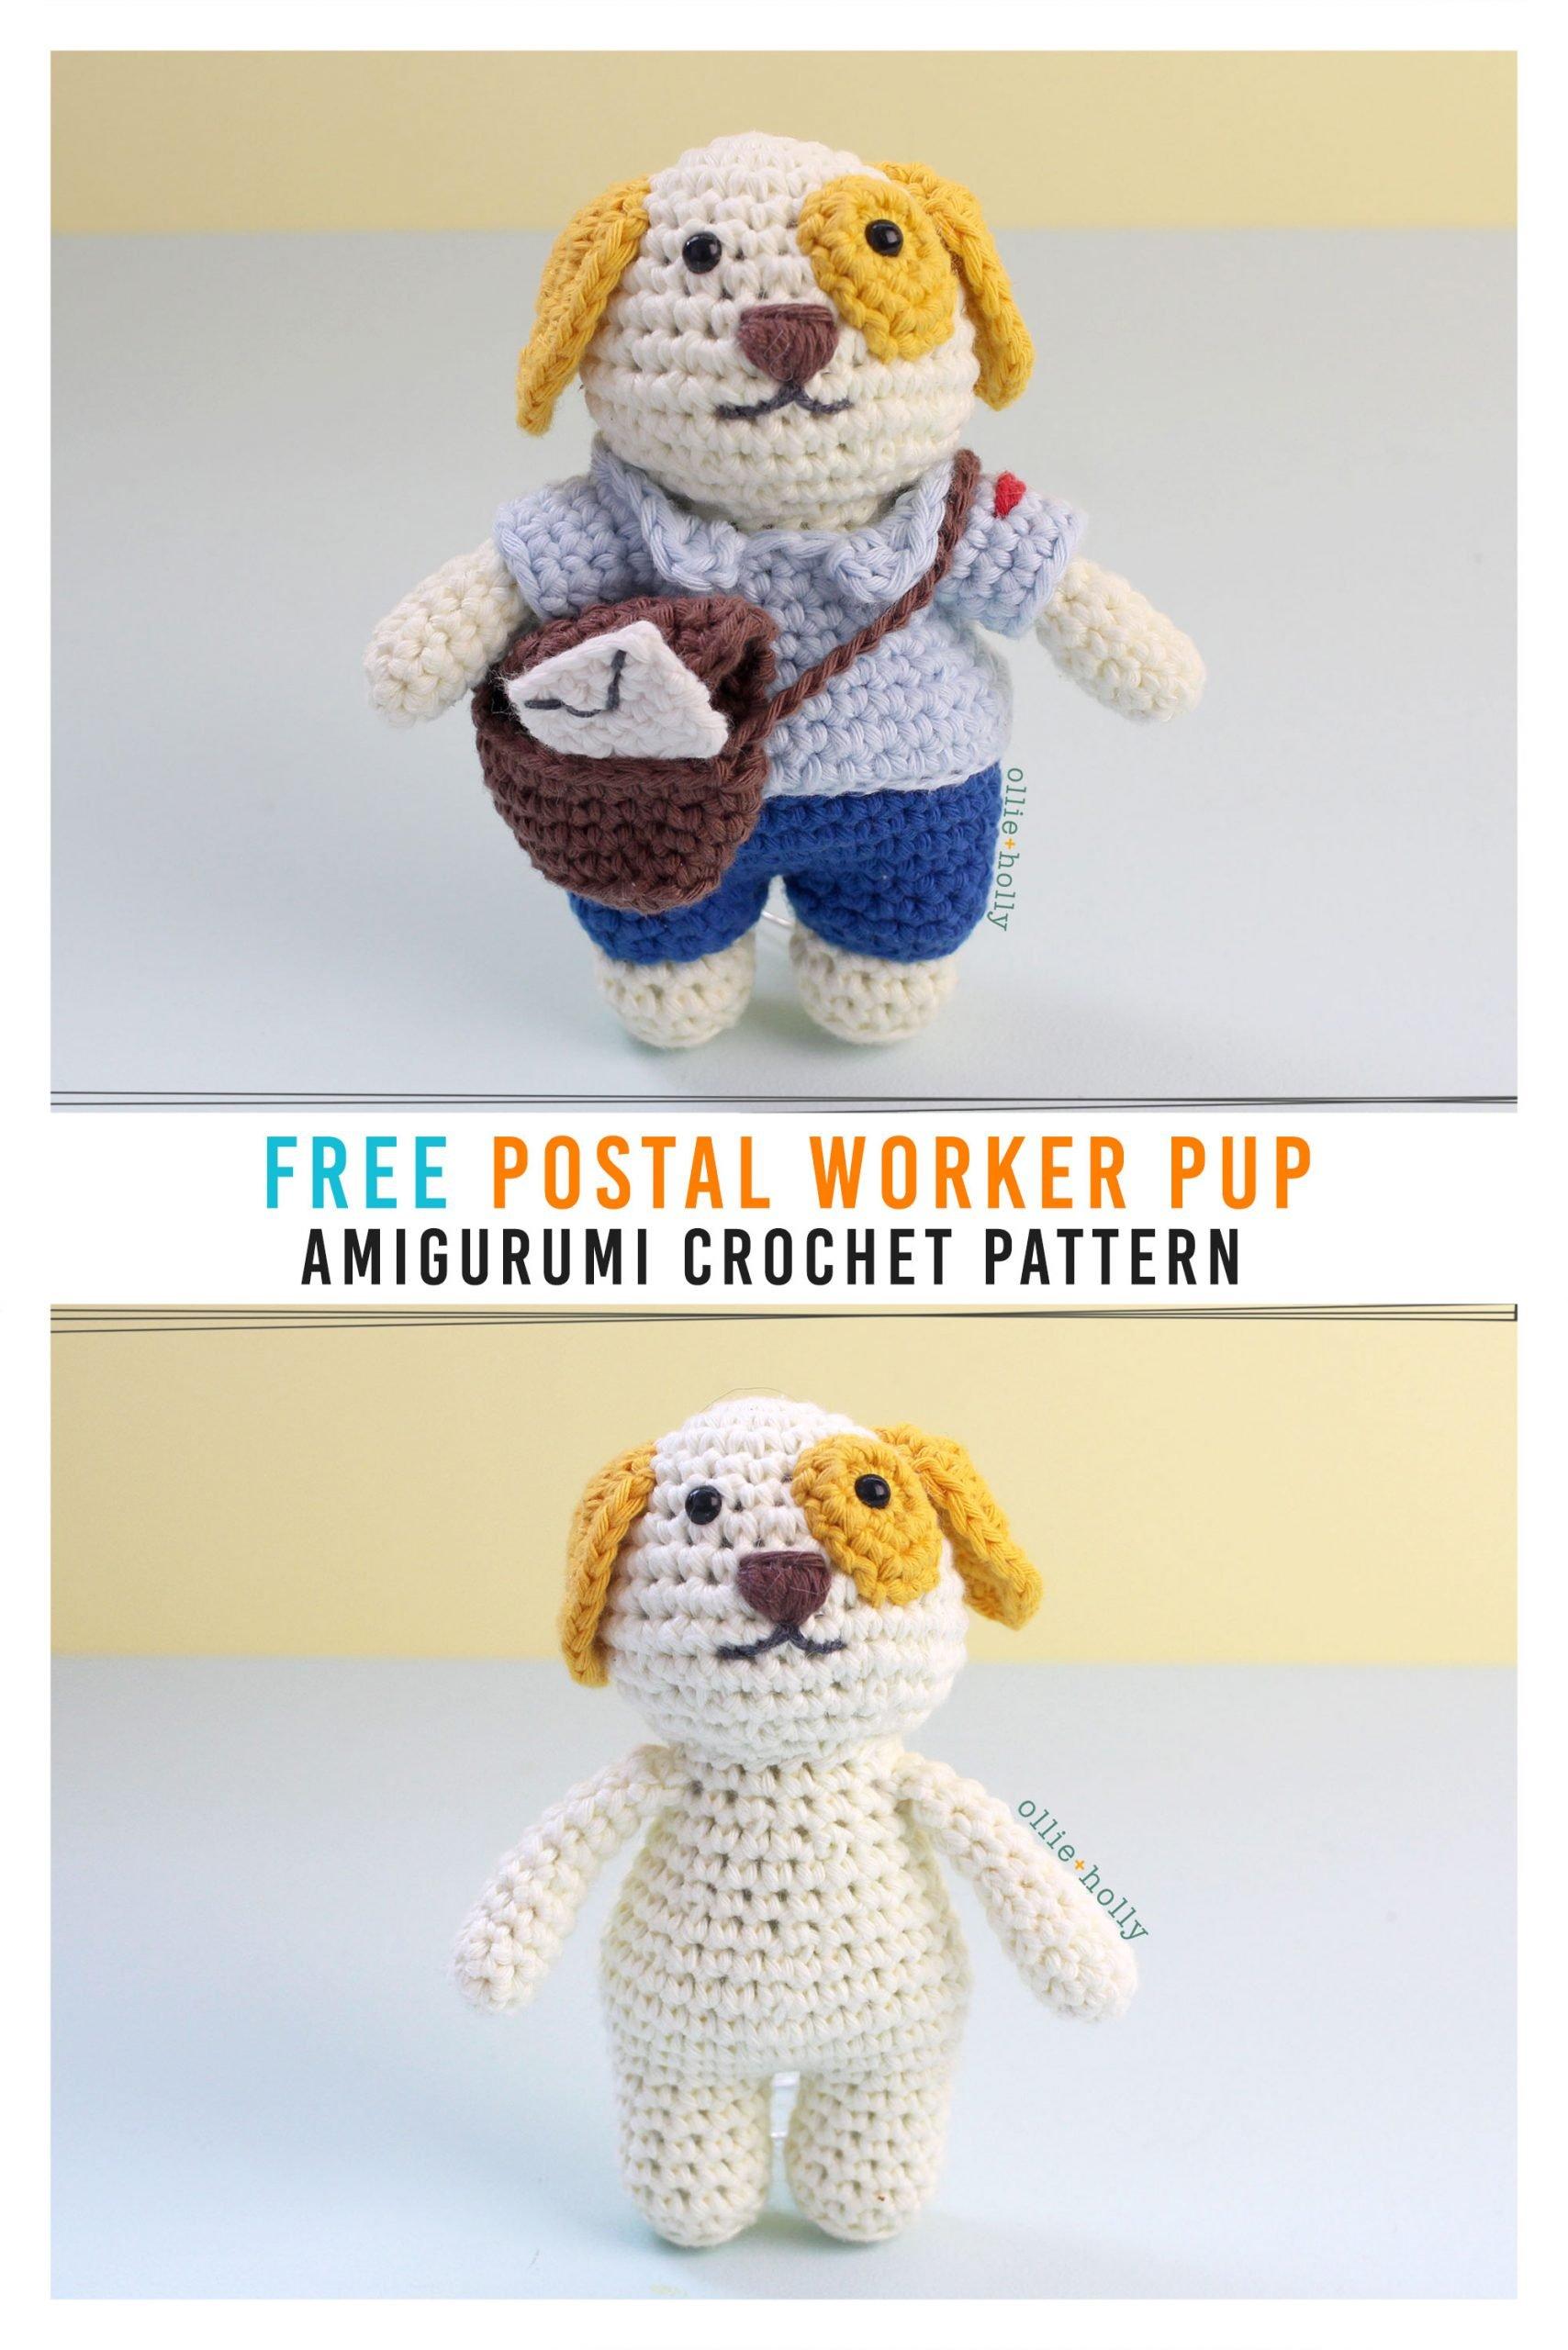 Free Postal Worker Puppy Stuffed Dog Amigurumi Crochet Pattern